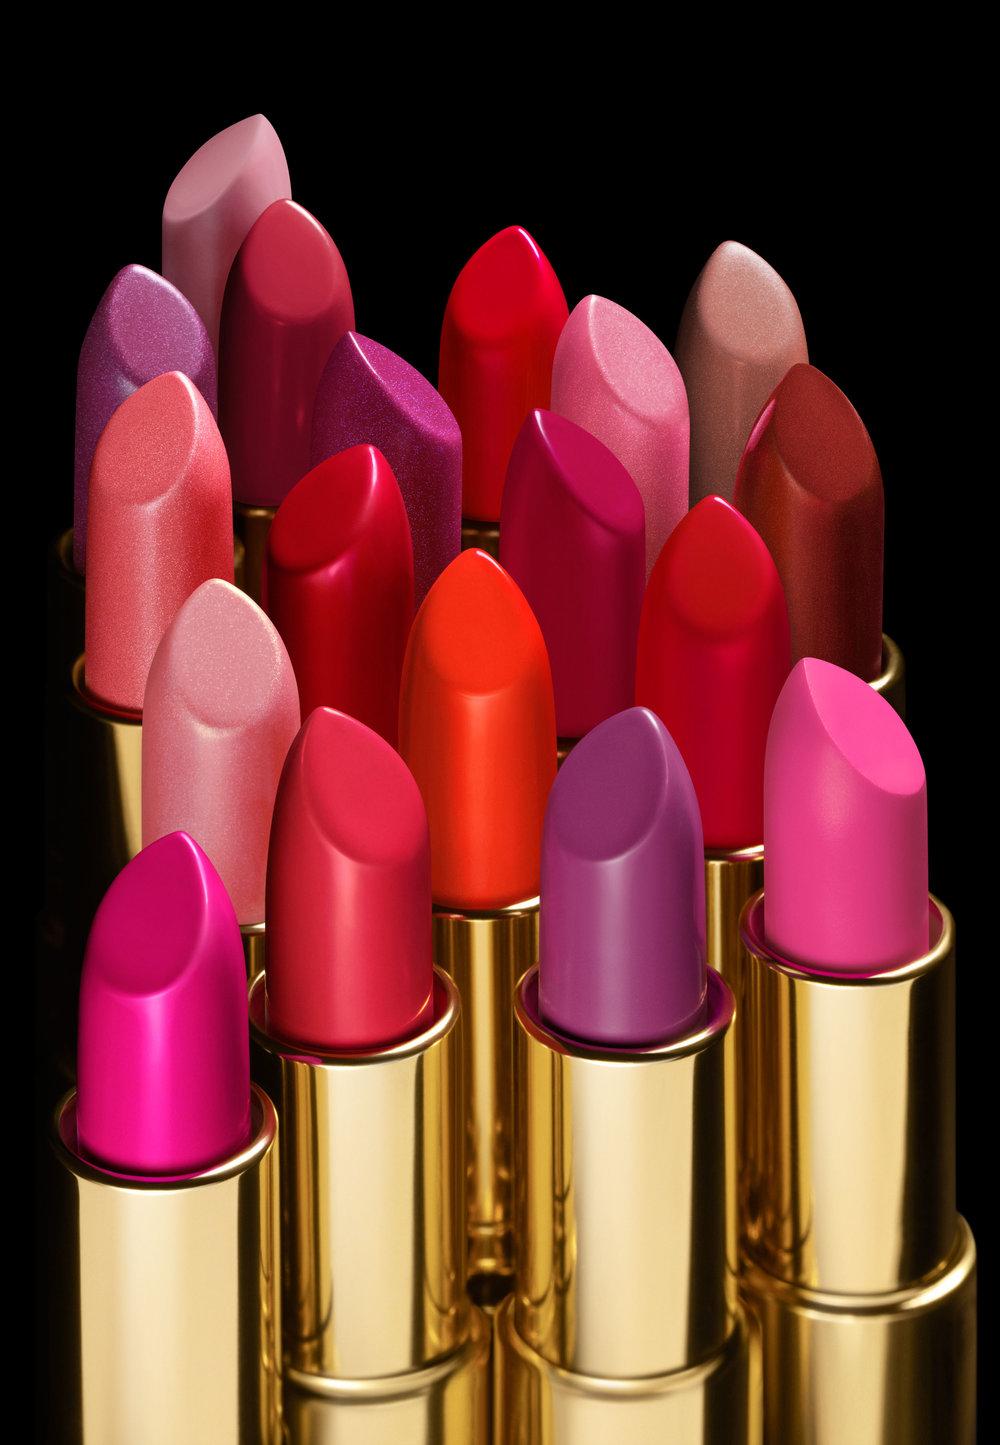 +Lipsticks_031_09_simp_RGB.jpg